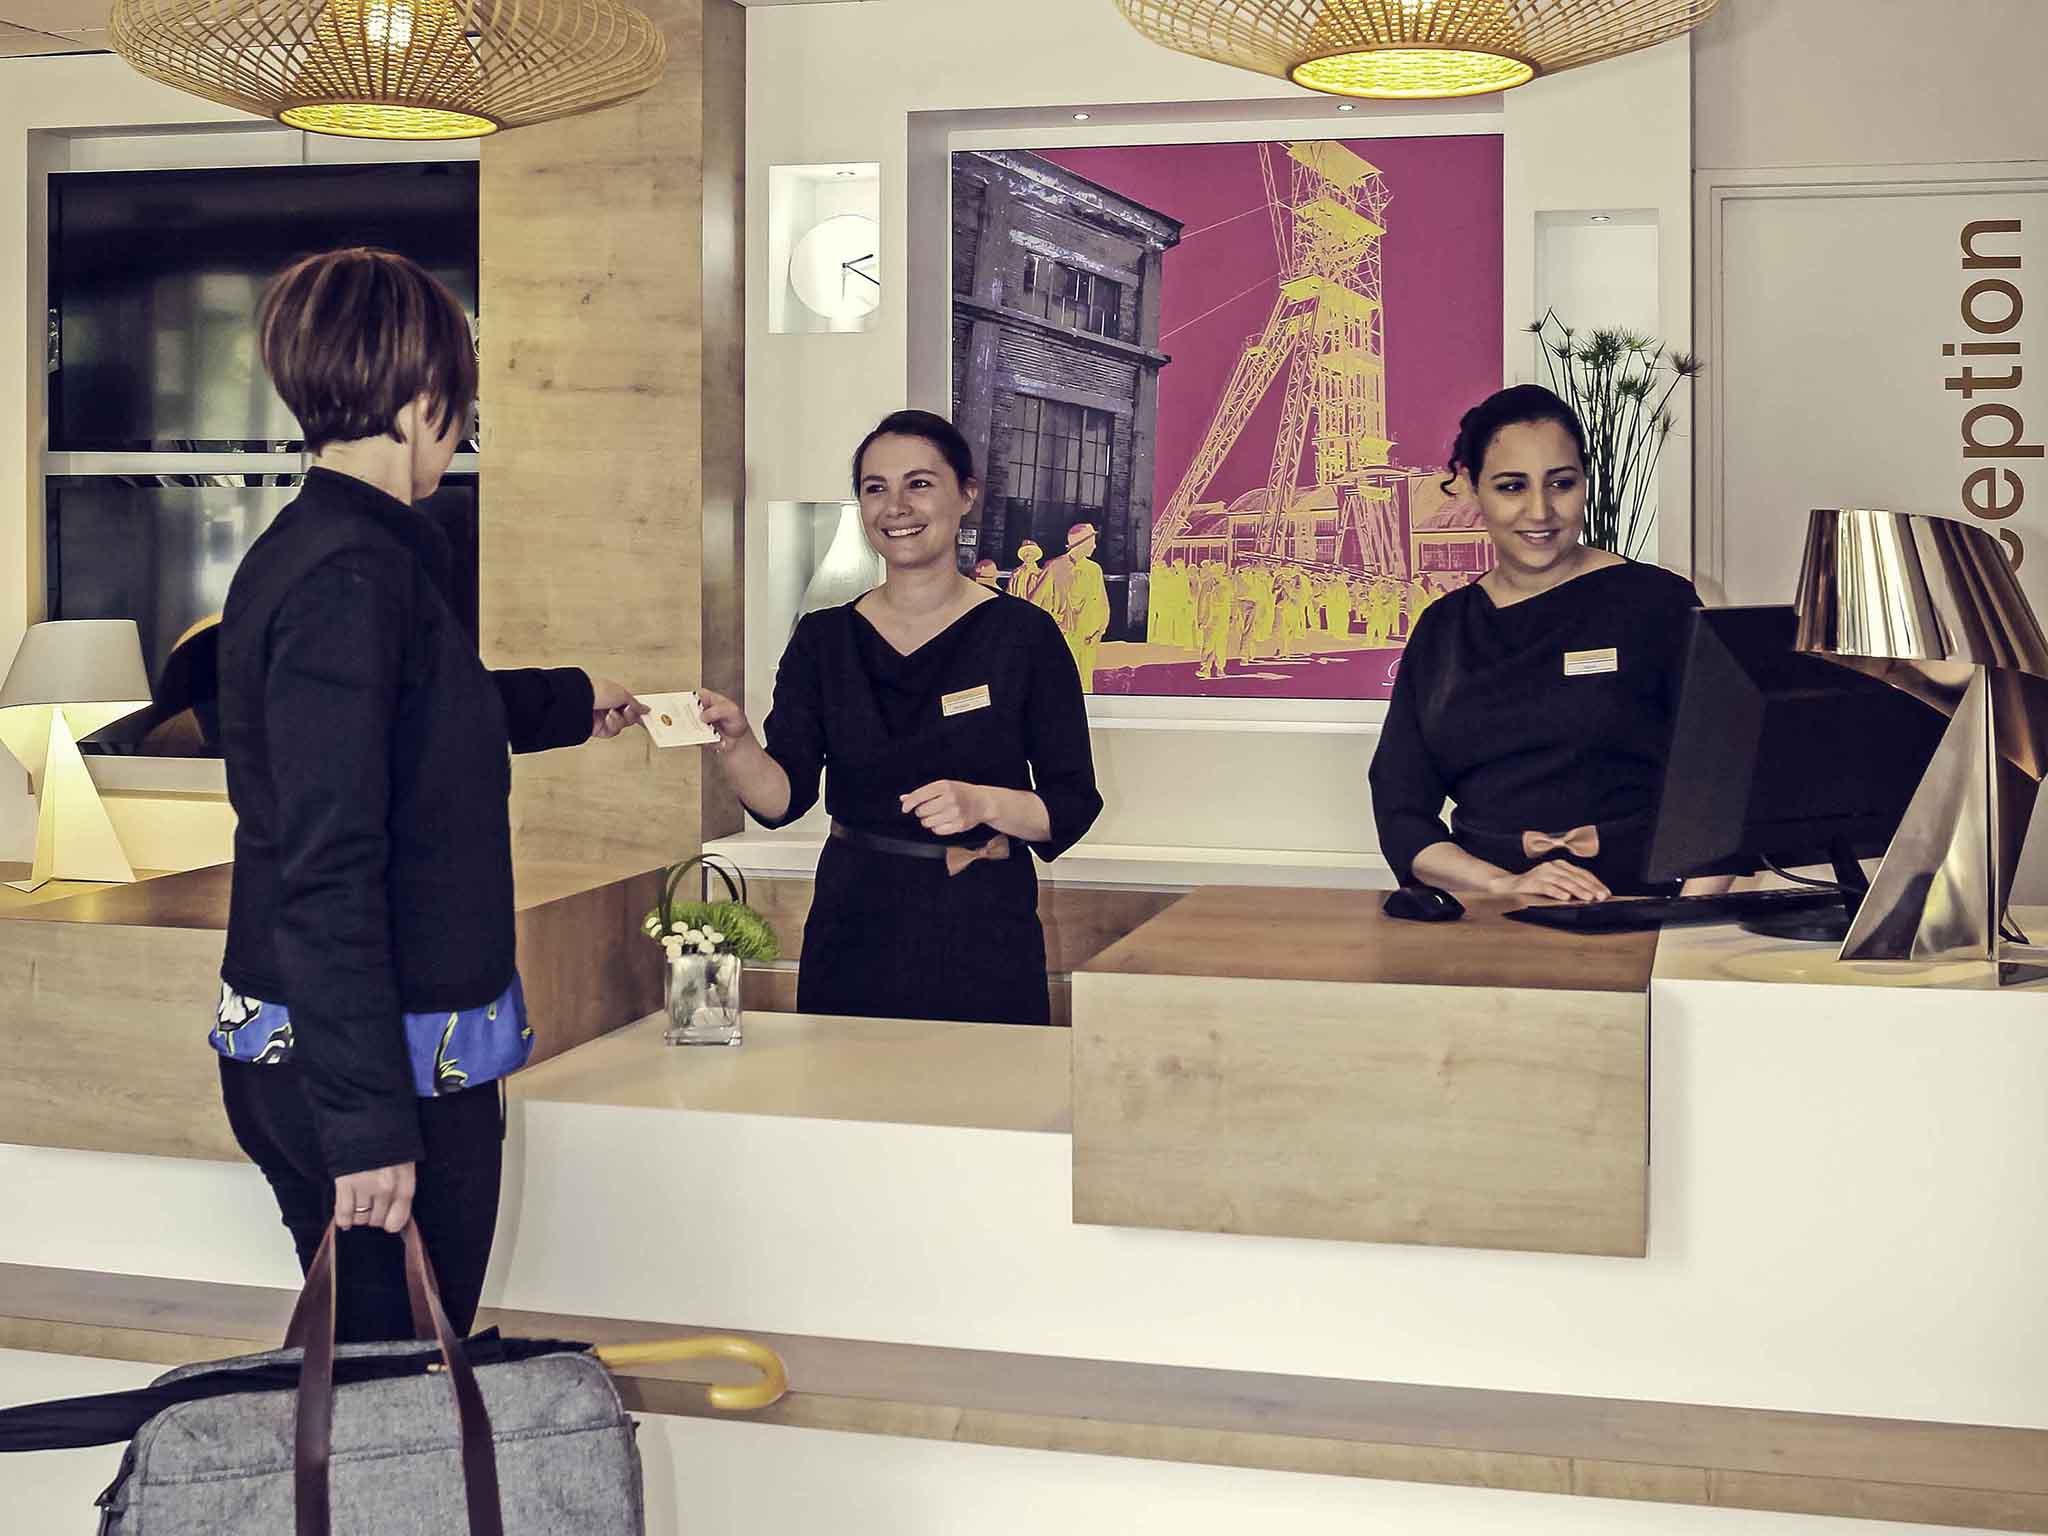 فندق - Hôtel Mercure Forbach